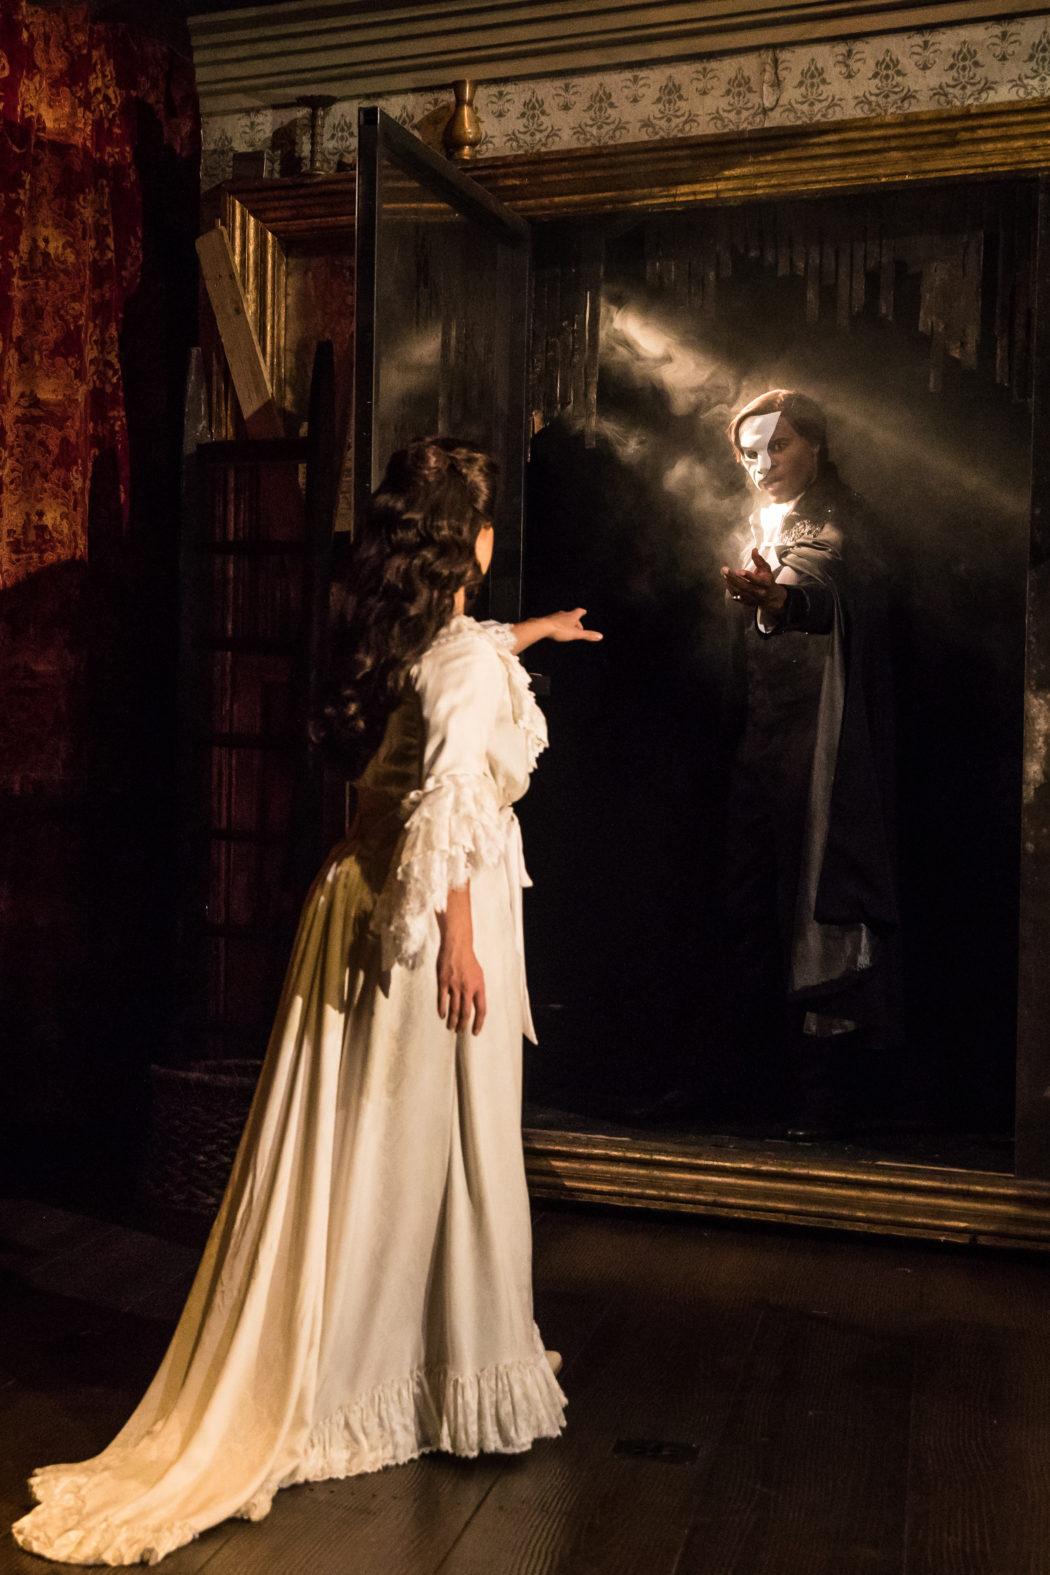 03. THE PHANTOM OF THE OPERA Eva Tavares and Derrick Davis photo by Matthew Murphy